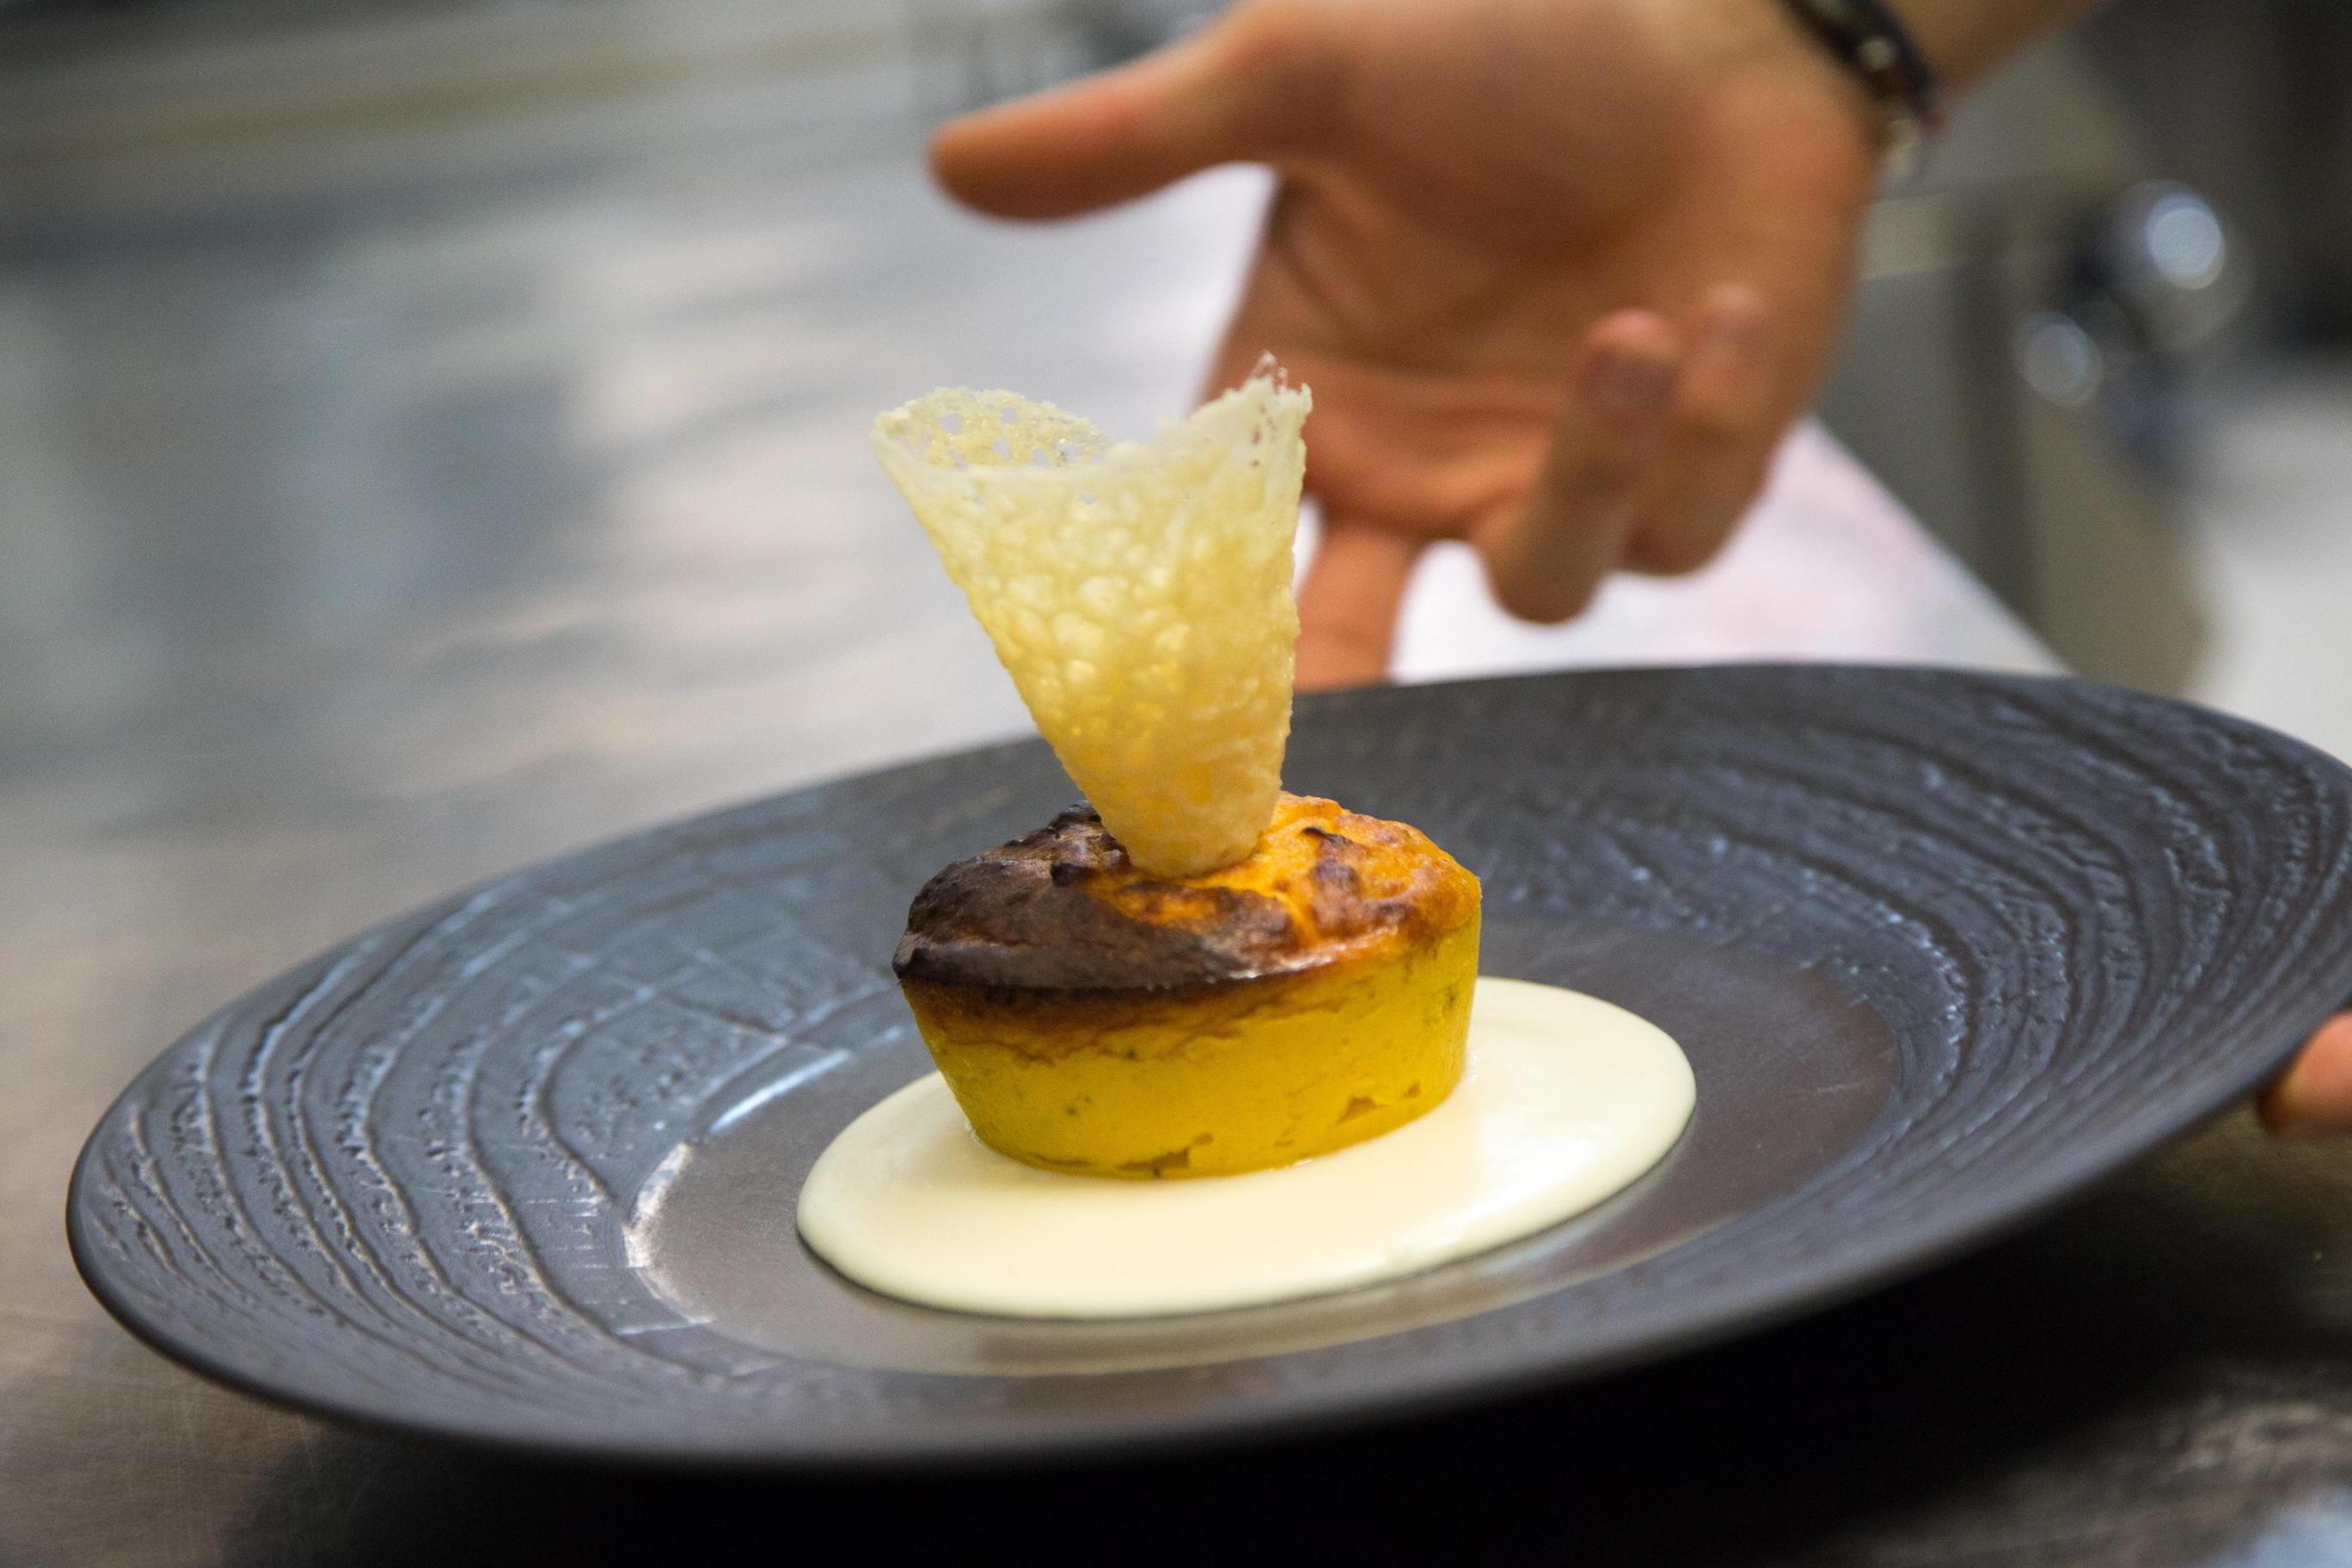 osteria-mascalzoni-menu-tortino